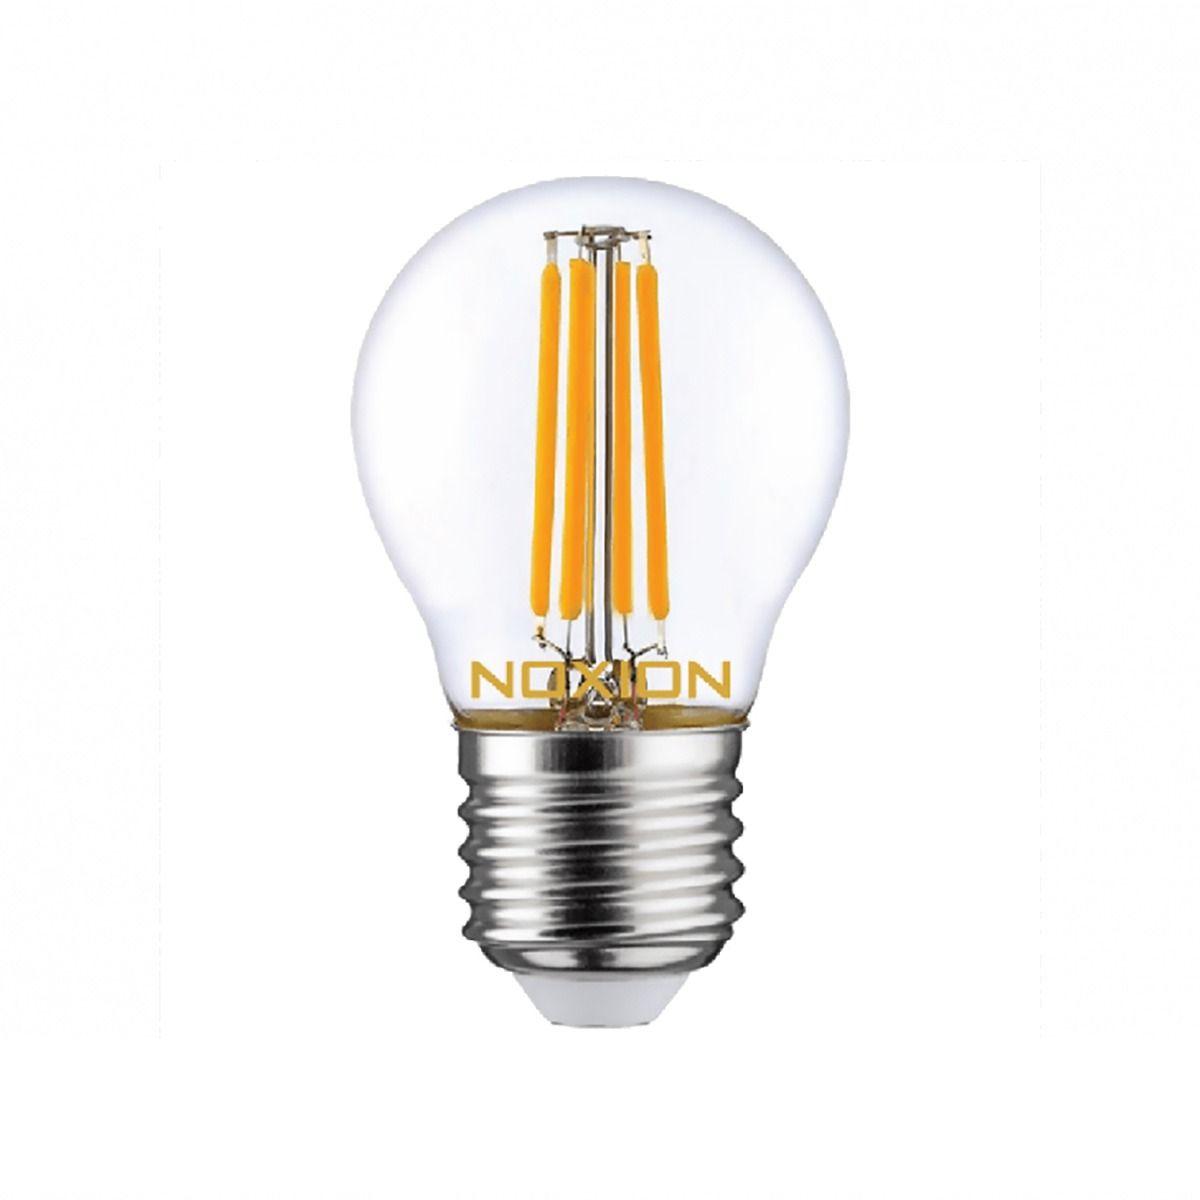 Noxion Lucent Filament LED Lustre 4.5W 827 P45 E27 Clear   Replacer for 40W